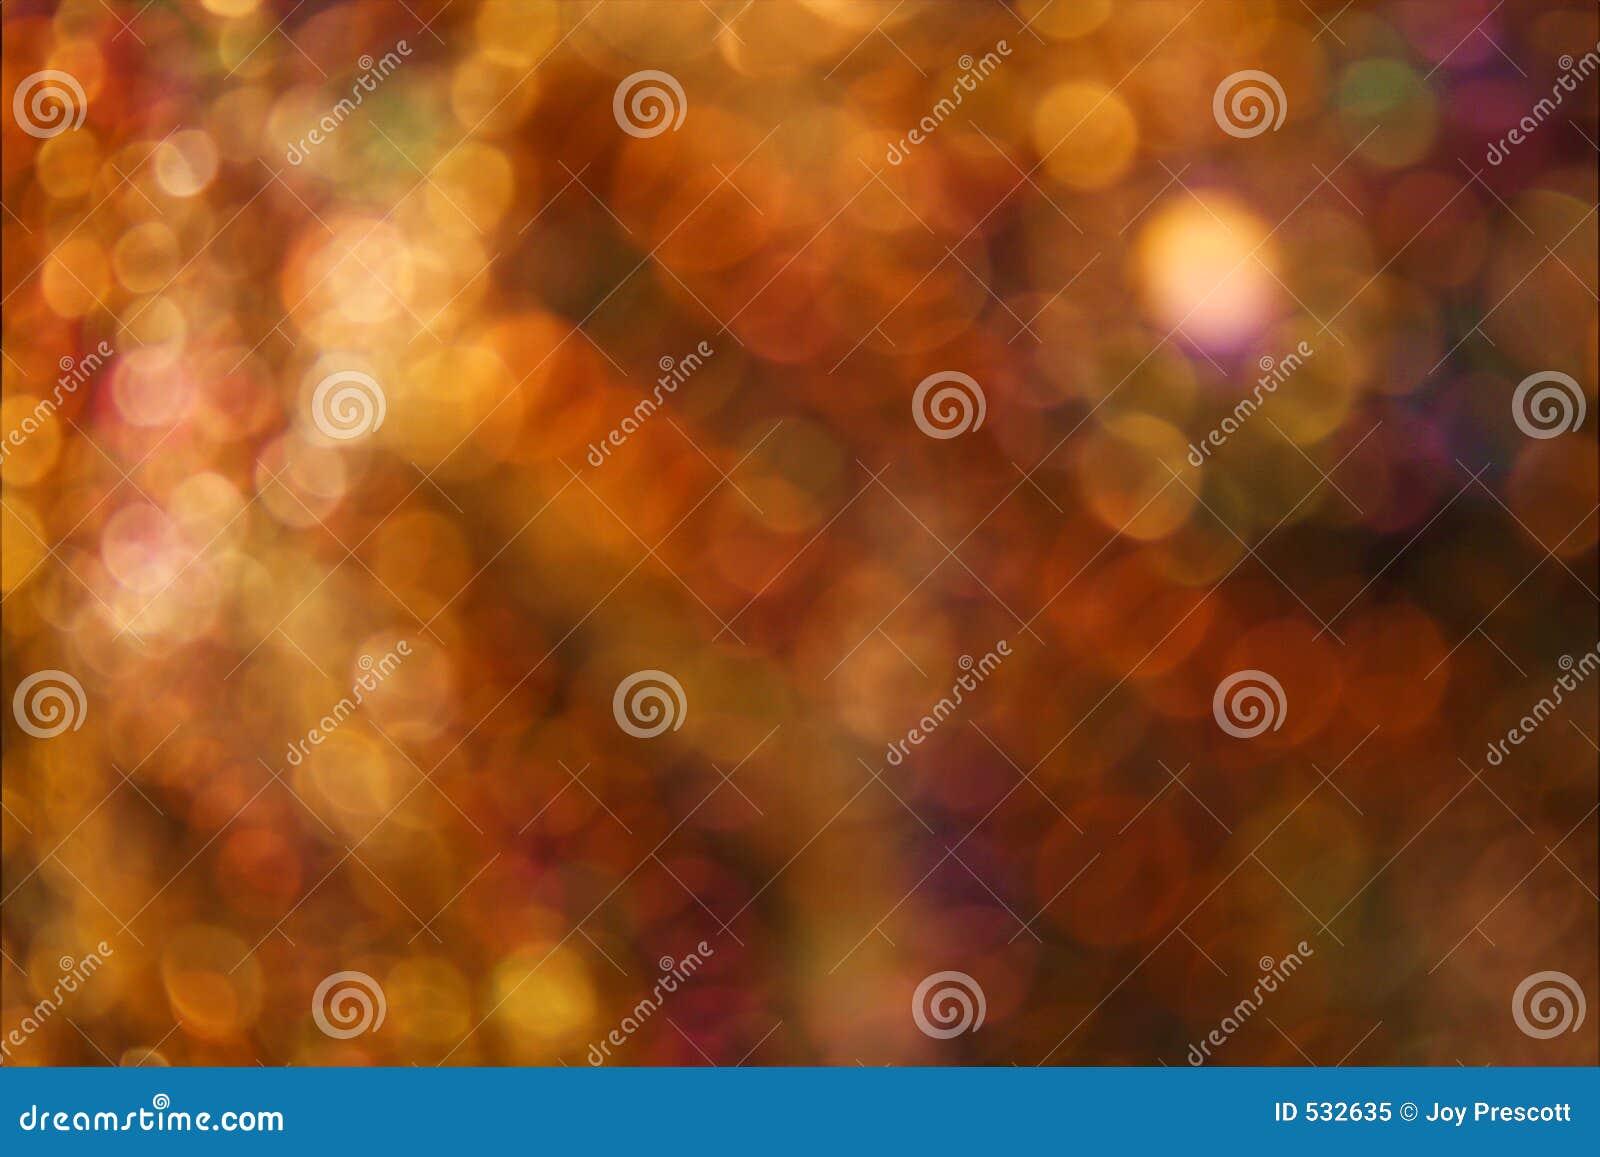 Download 迷离光 库存图片. 图片 包括有 生日, 当事人, 晚上, 抽象, 蓝蓝, 巴士拉, 亮光, 金子, 焕发, 庆祝 - 532635